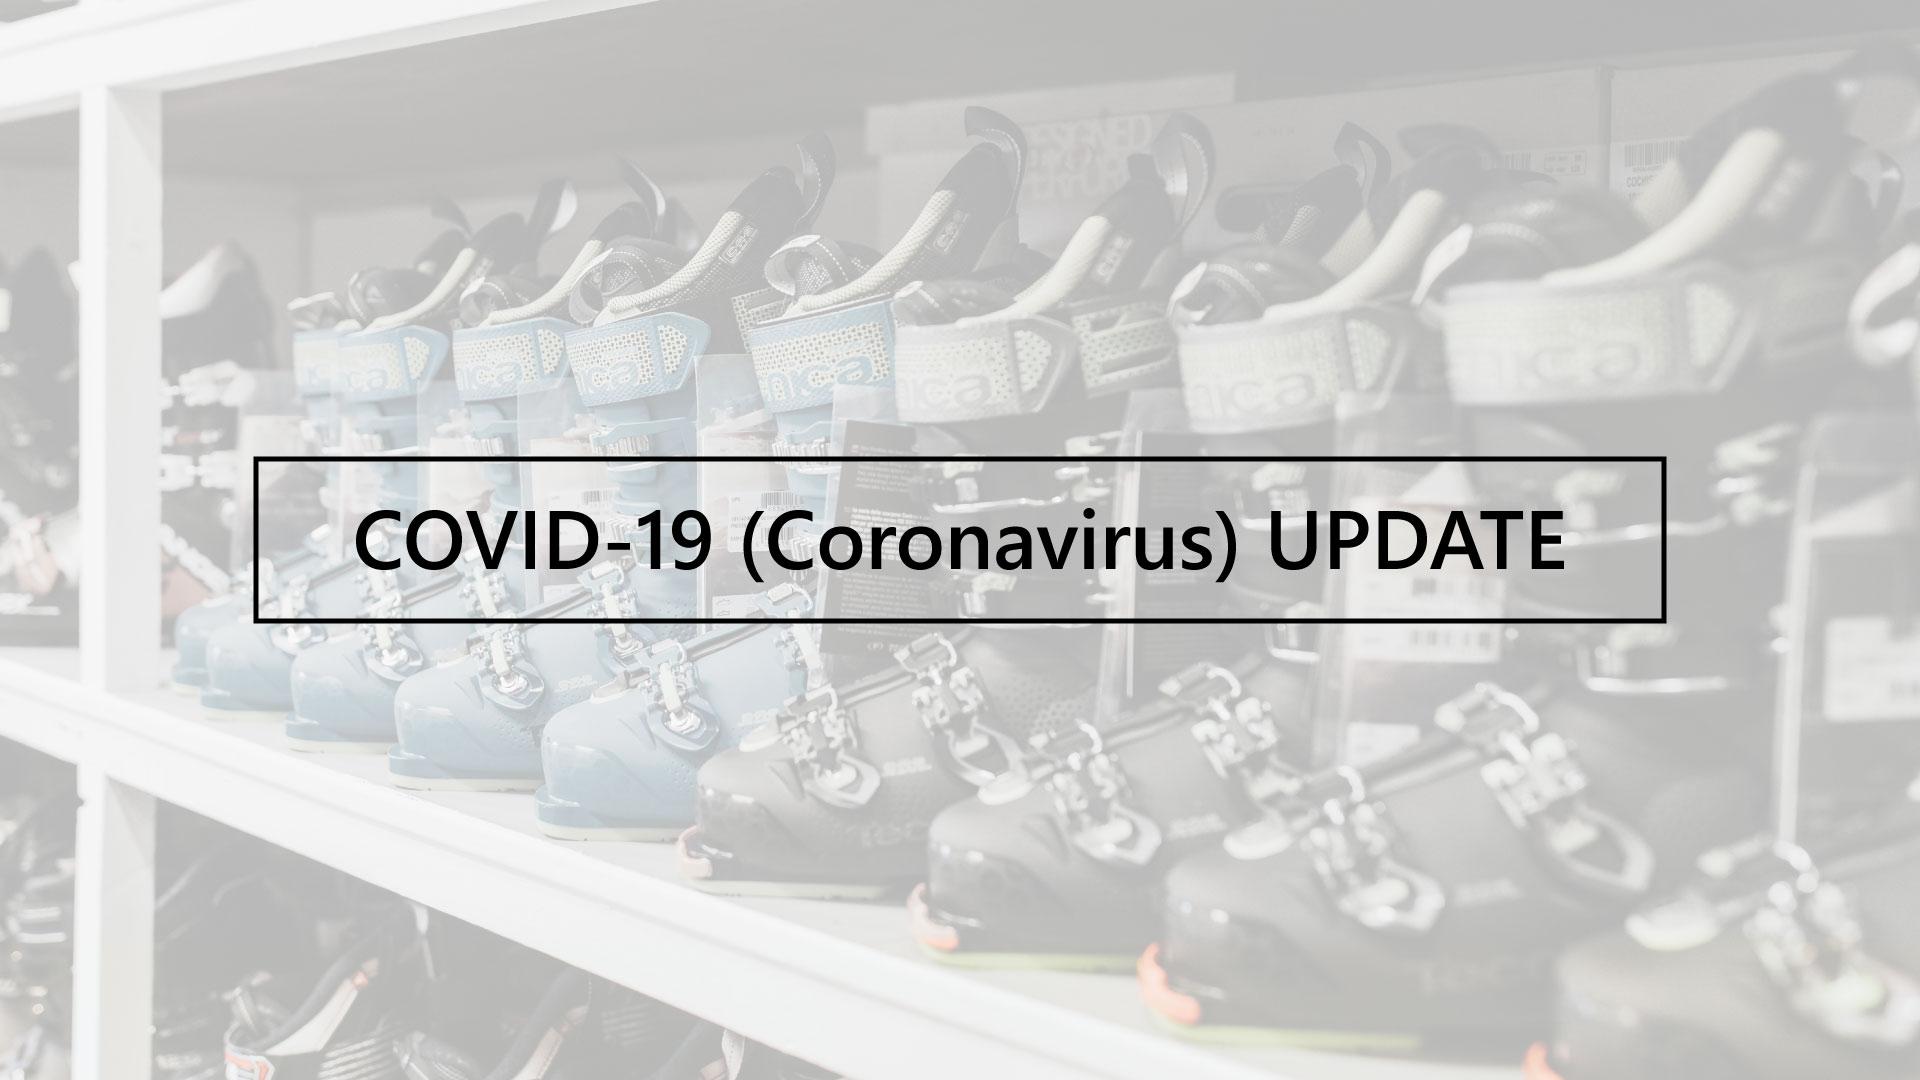 Snowtrax COVID-19 Coronavirus Updates